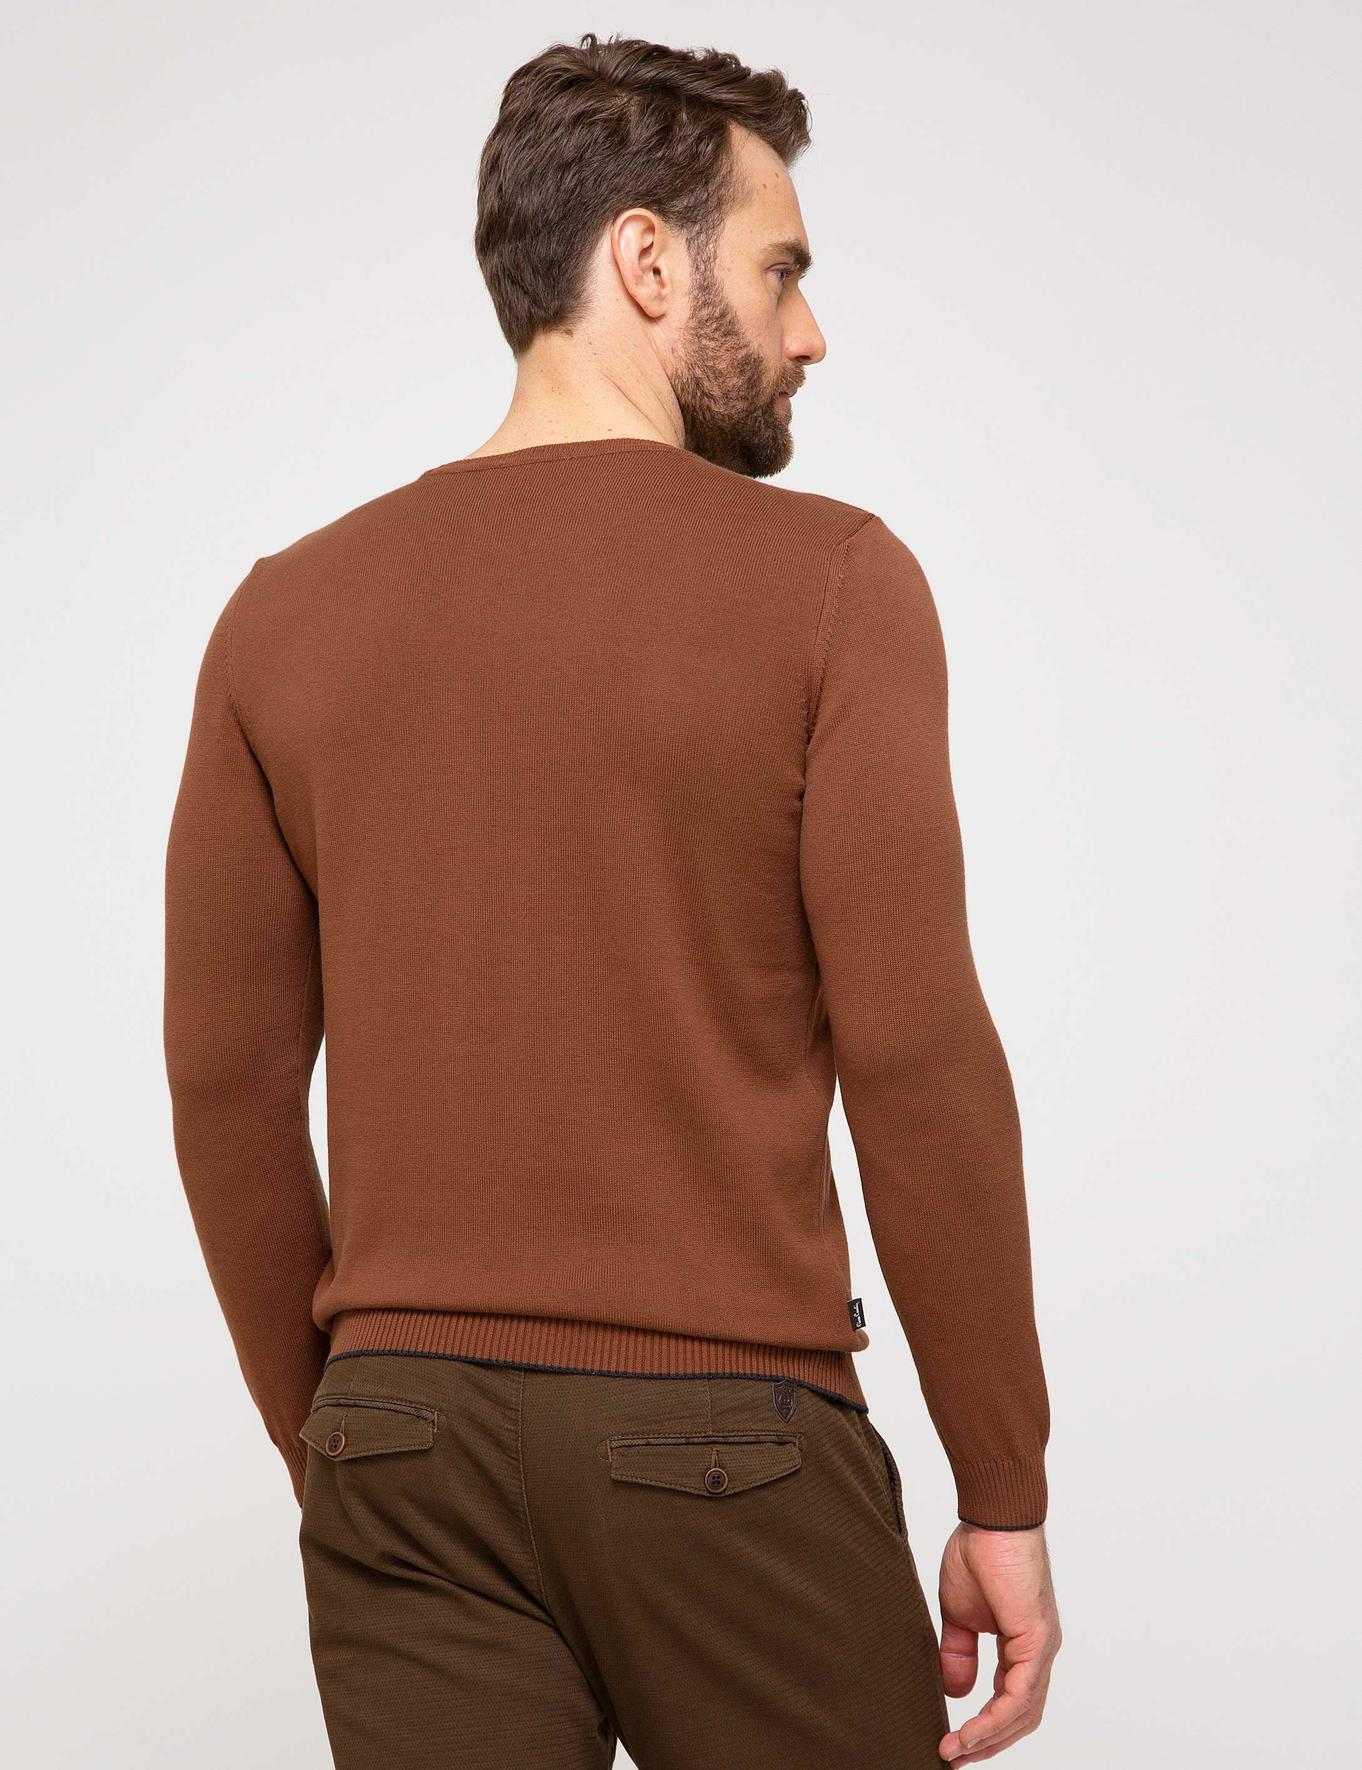 Turuncu Slim Fit Basic Triko Kazak